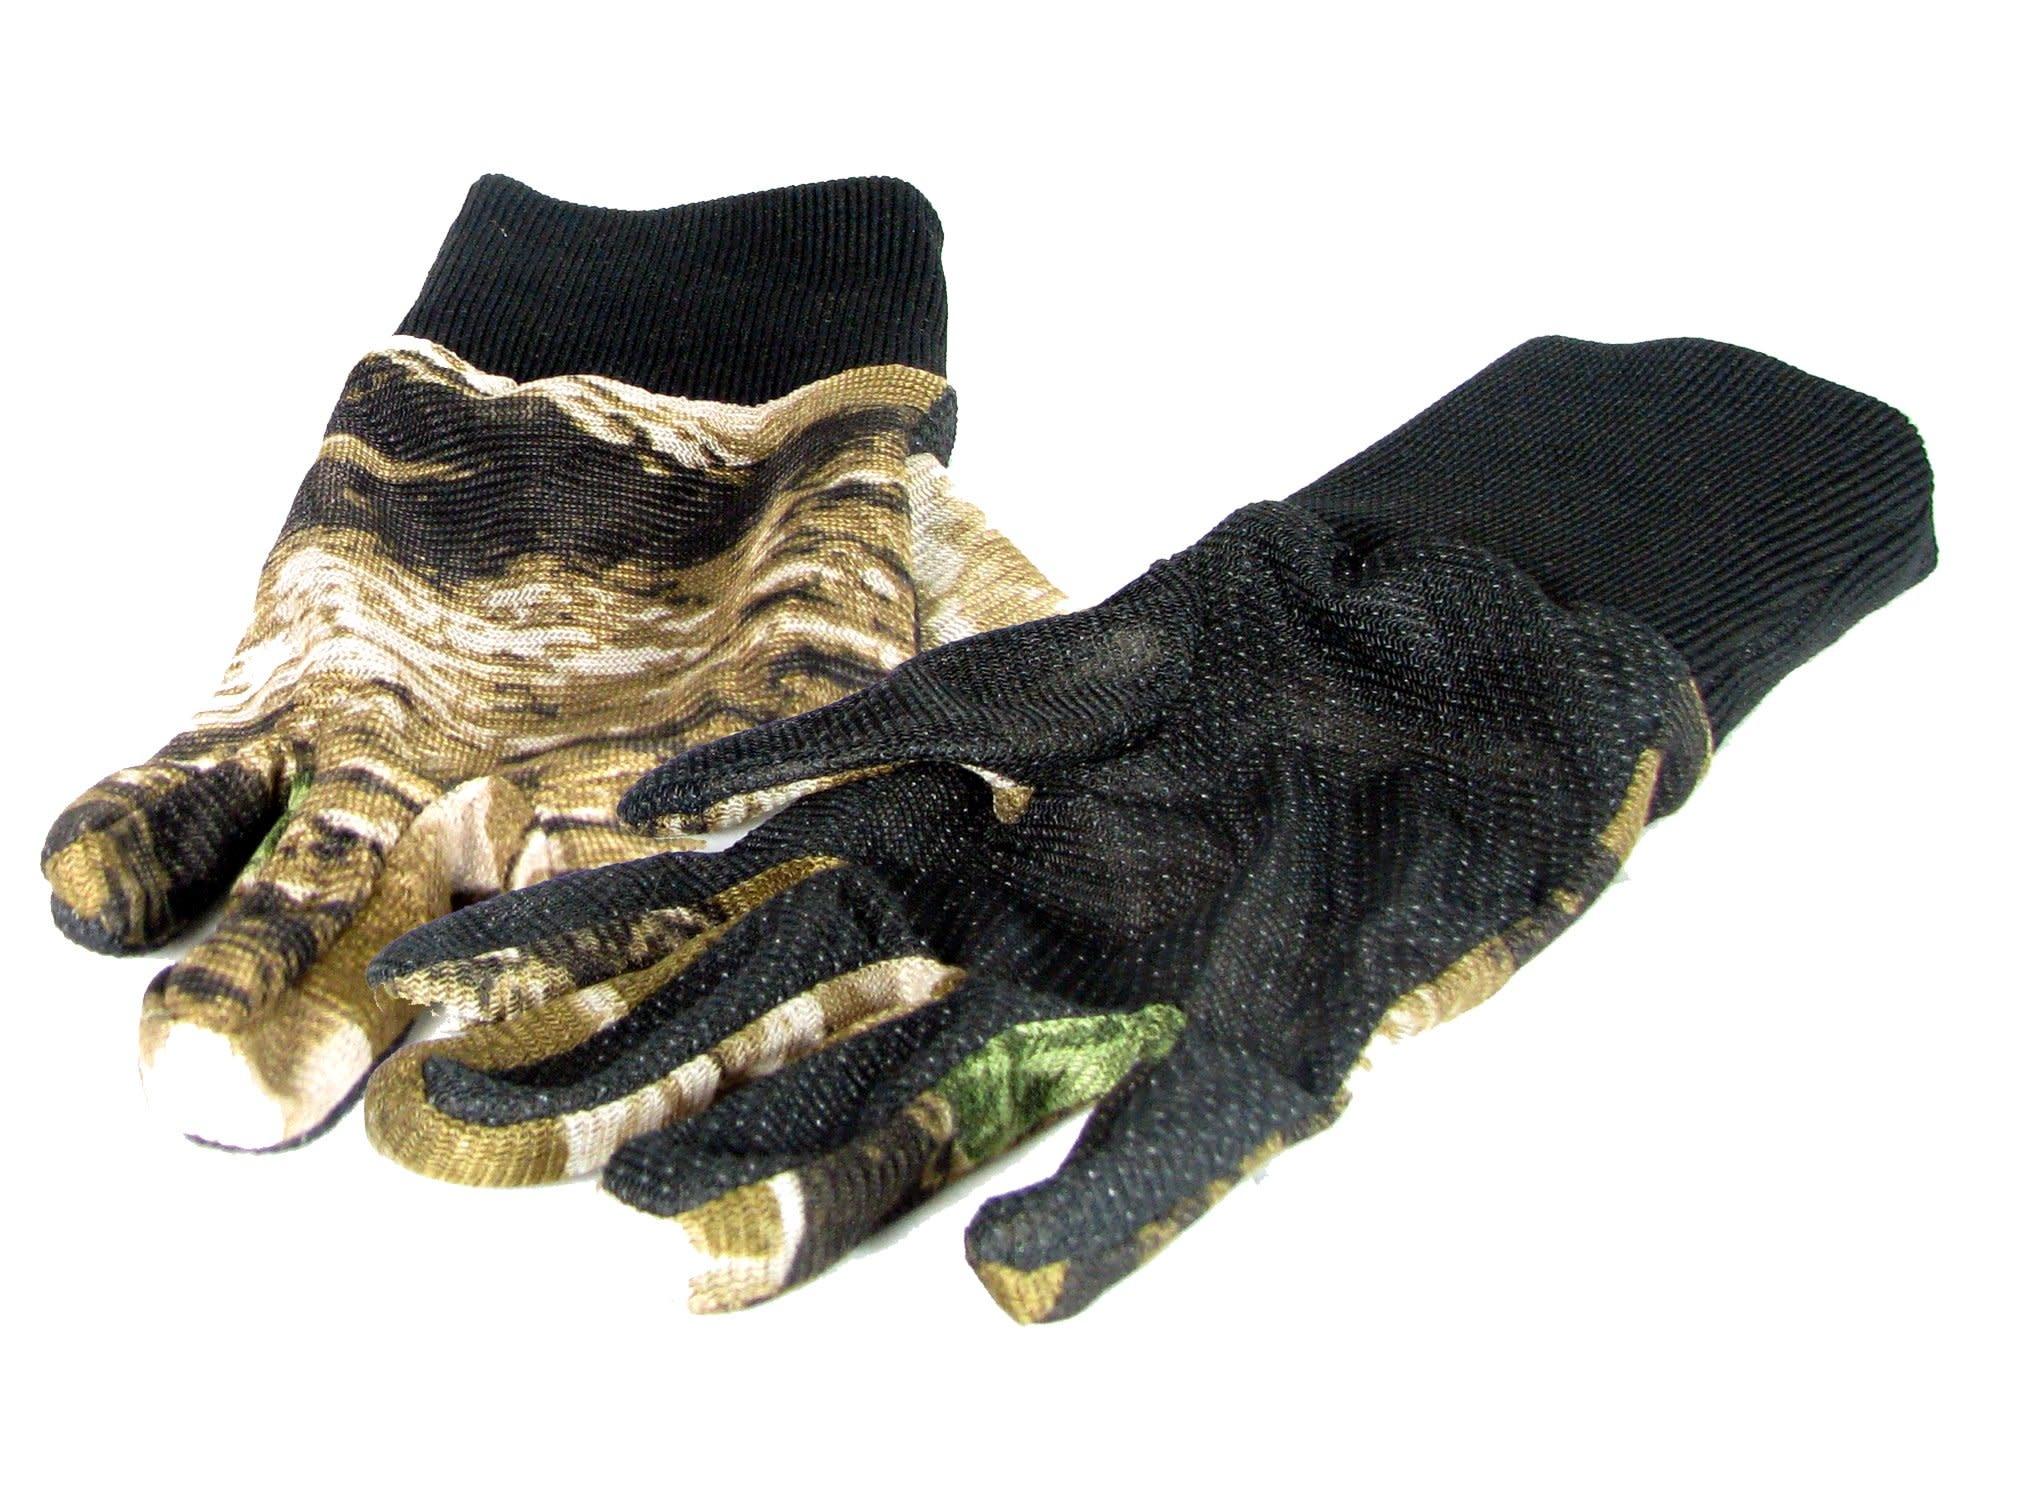 Wildhunter Camouflage net-handschoenen met anti-slip handgreep